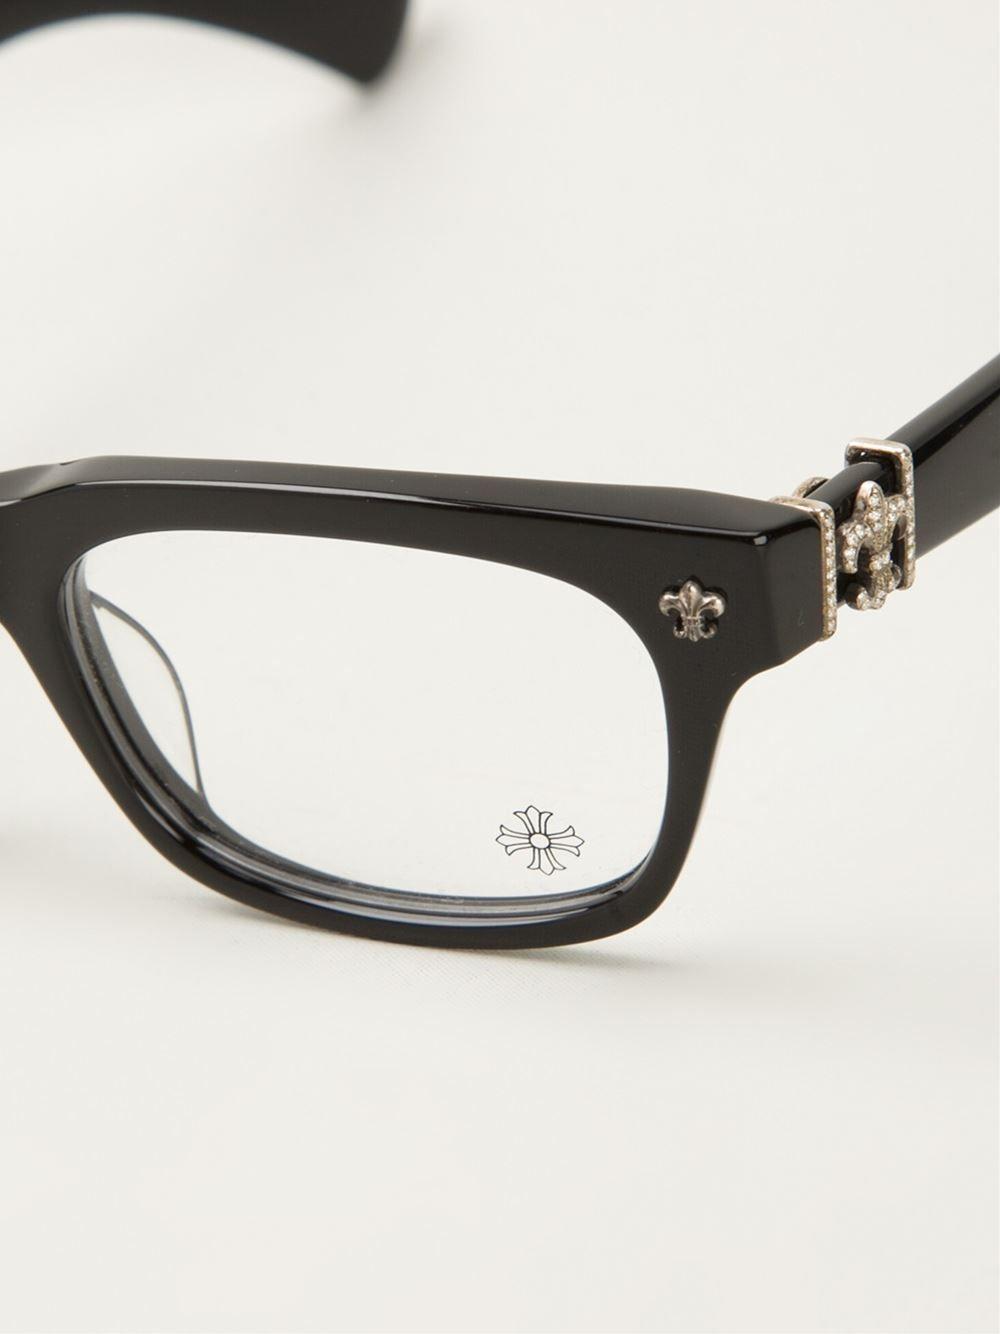 8cf10a5e0952 Eyeglasses · http   www.farfetch.com es shopping item10636731.